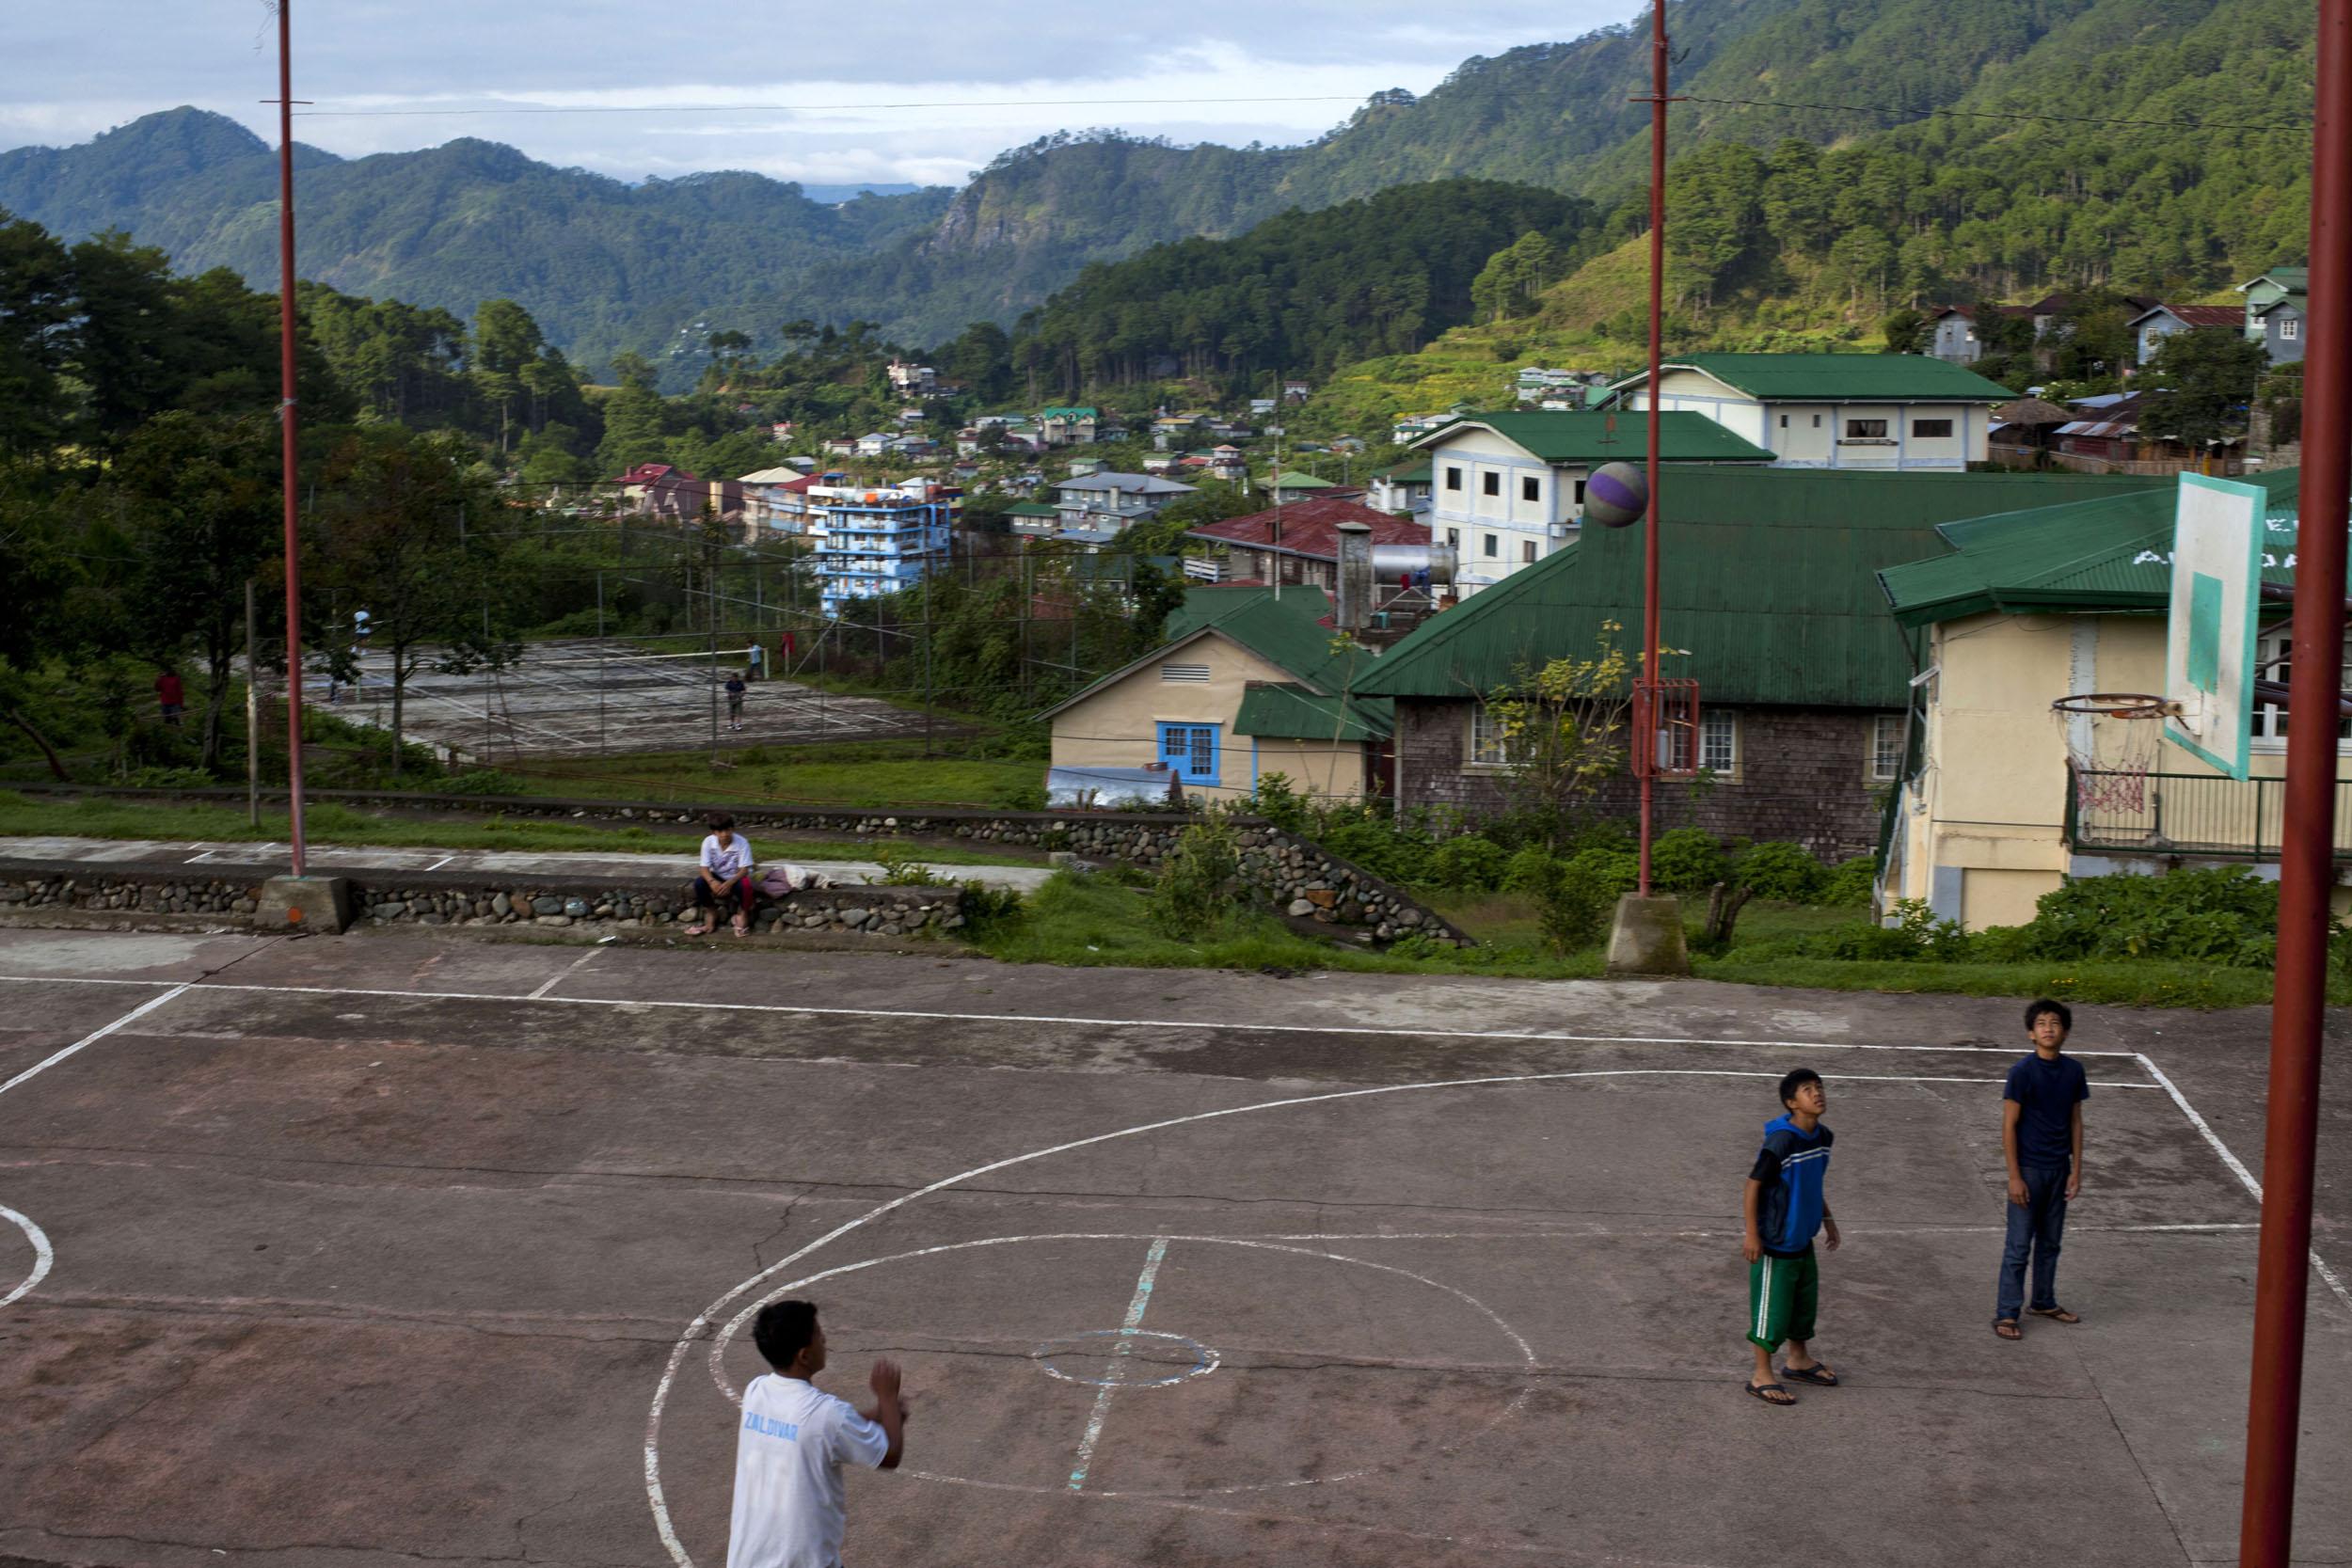 Sagada municipality local basketball court province of Mountain Province Philippines Aug 2011 01